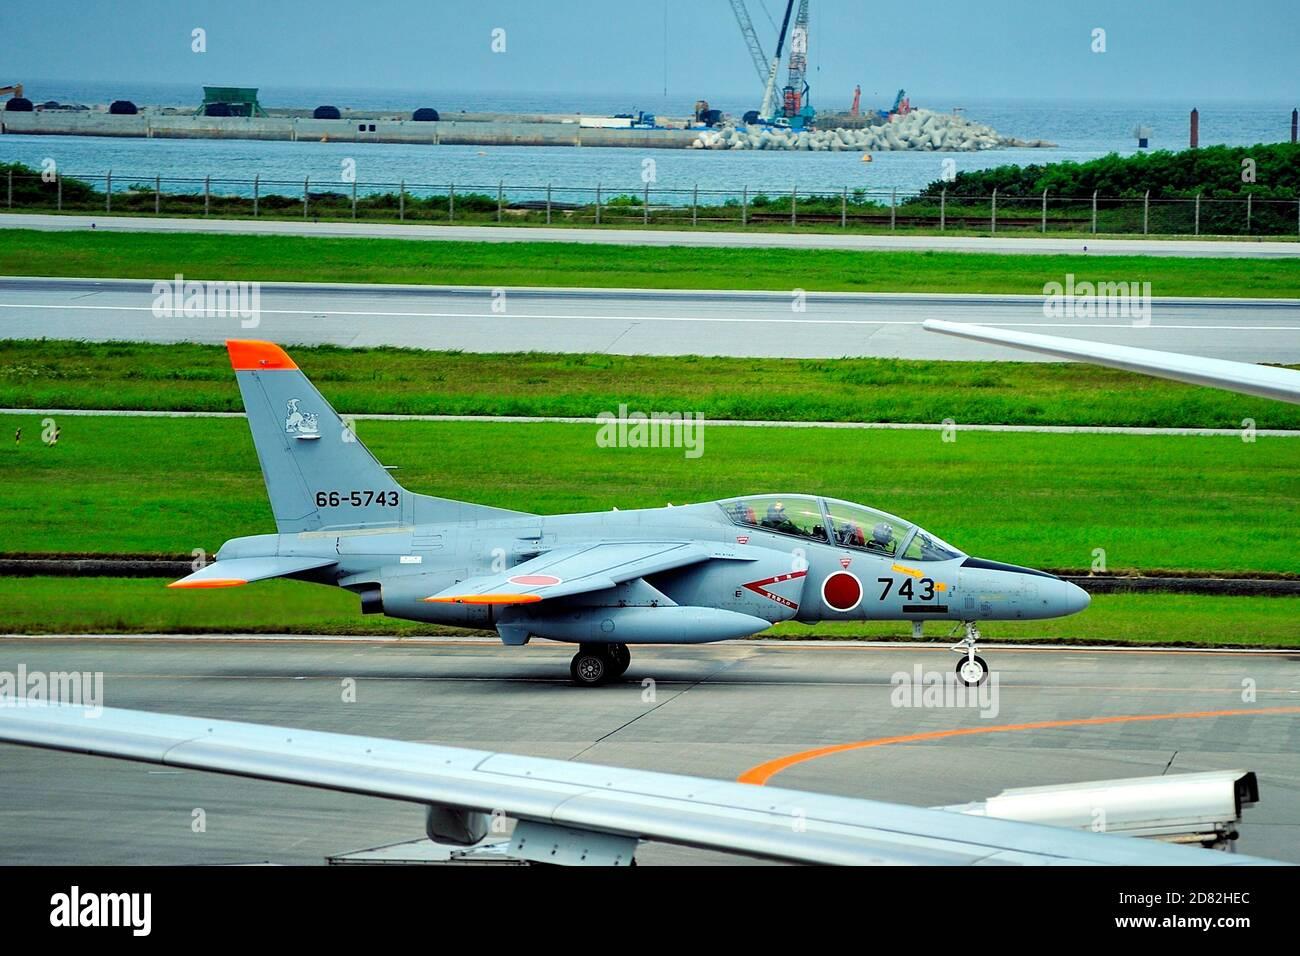 JAF,  Kawasaki T-4 Trainning Jet, 66-5743, Naha Airport, Okinawa, Japan Stock Photo